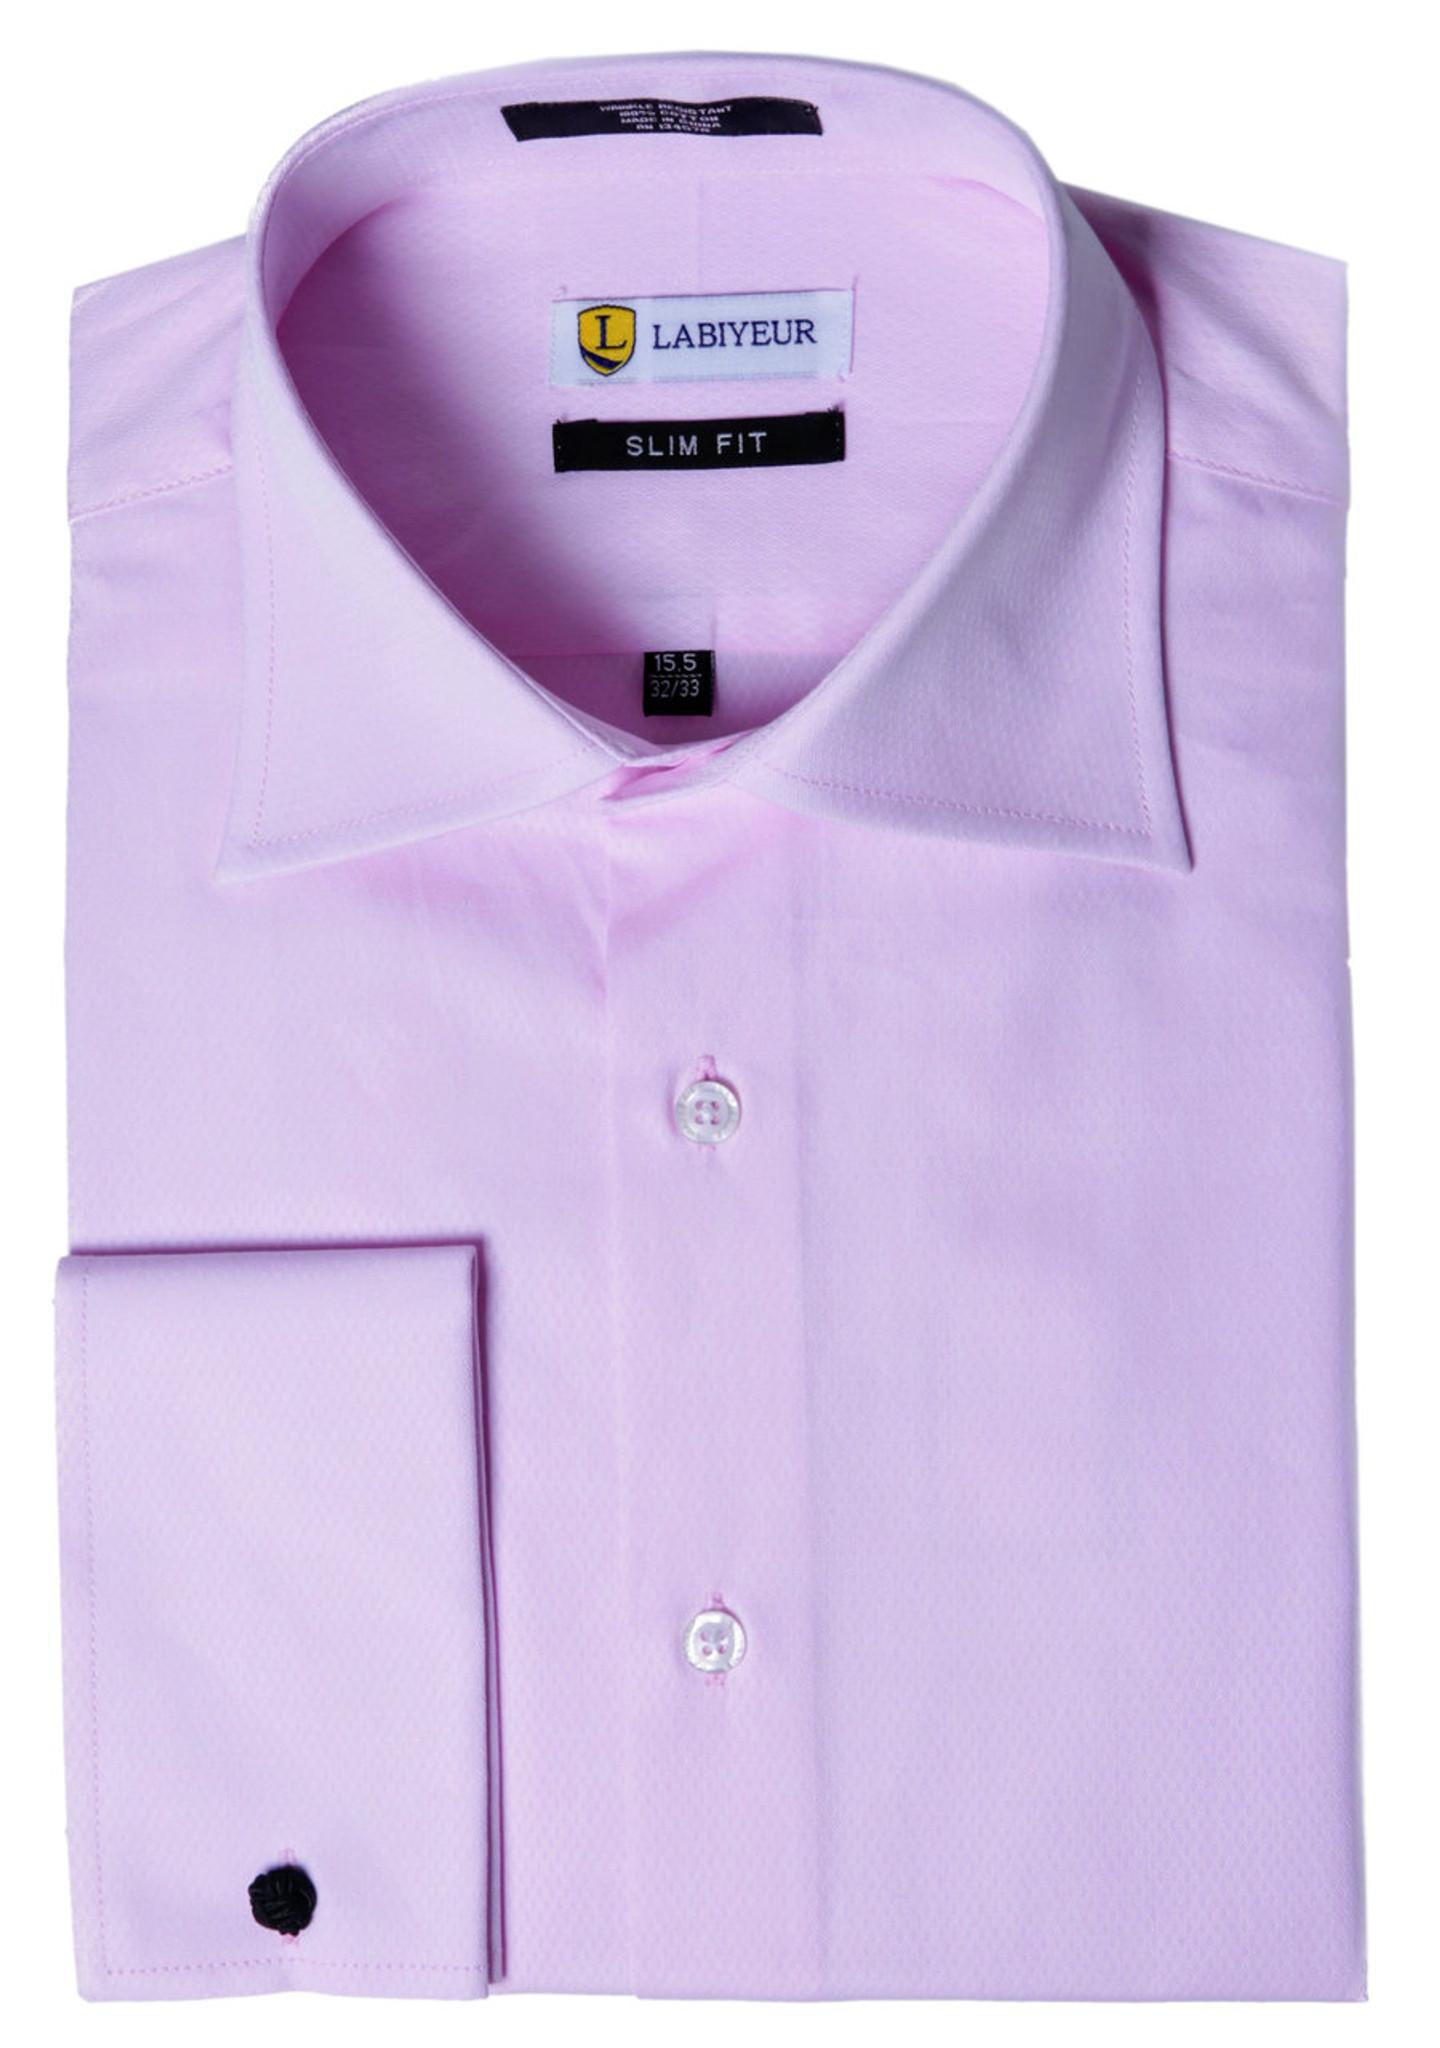 8704150edf2360 Labiyeur Men's Slim Fit French Cuff Textured Dress Shirt Pink Click to  enlarge ...